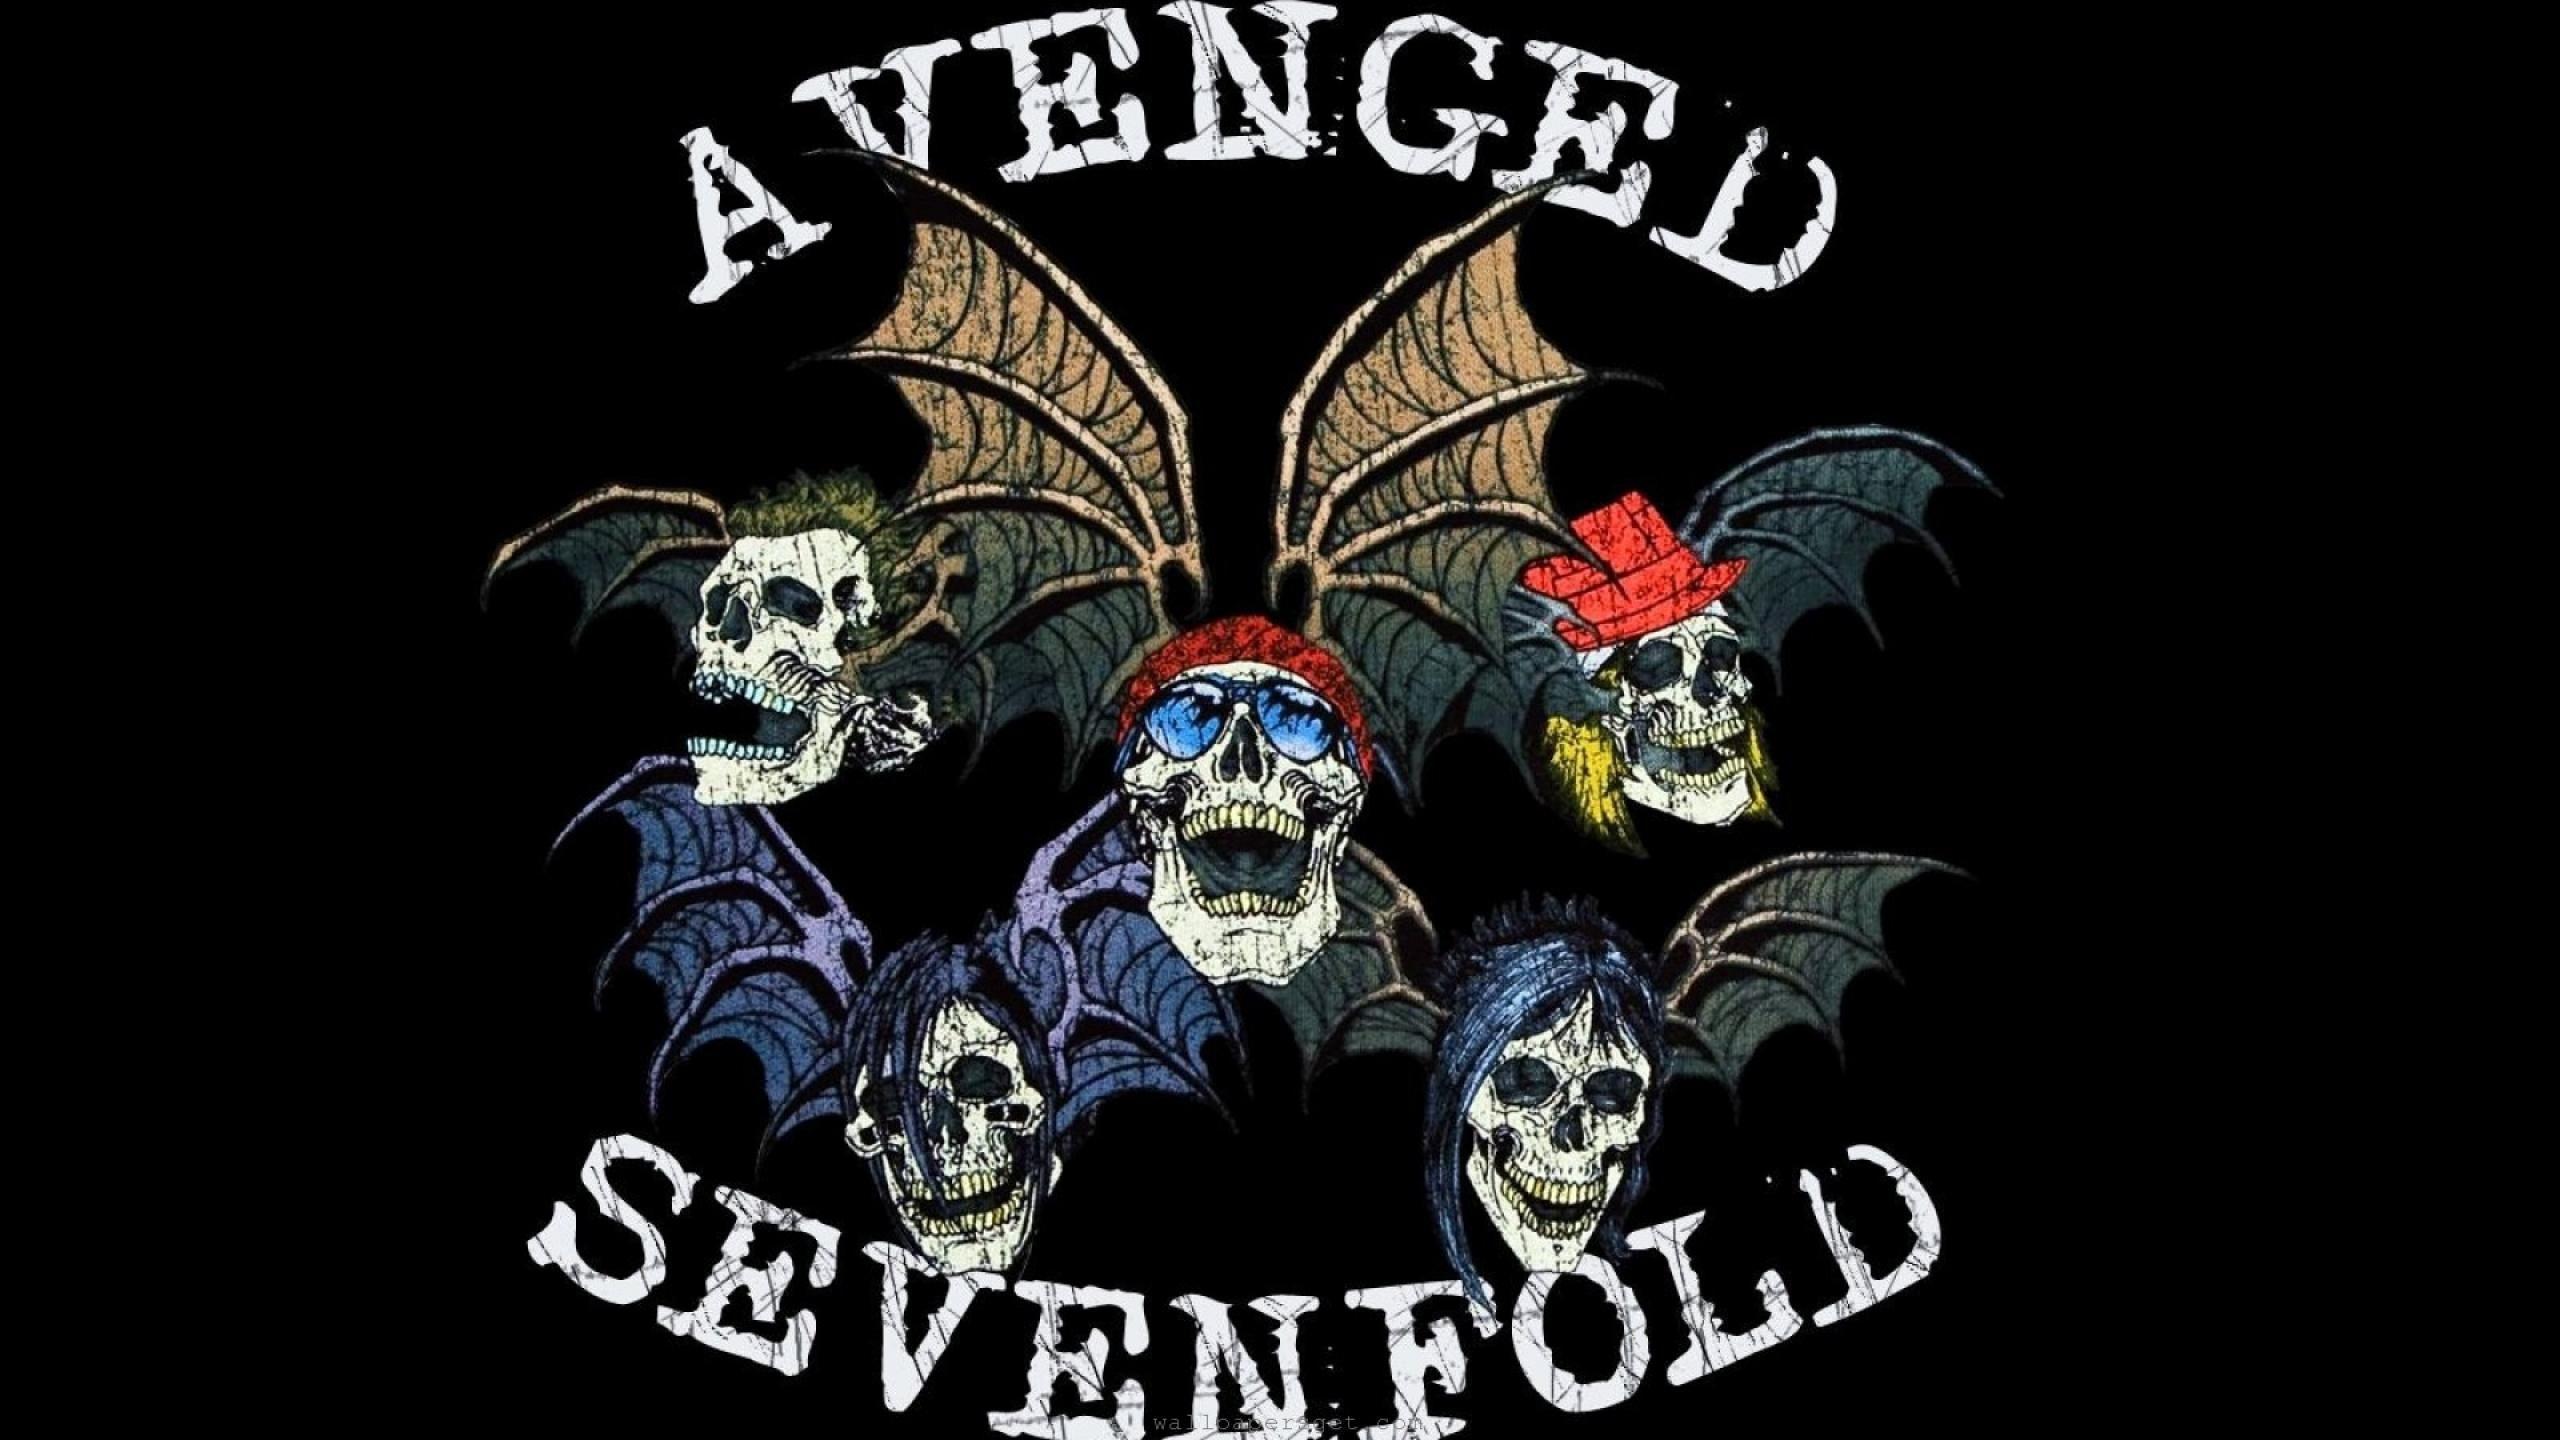 SEVENFOLD MUSICA M.I.A BAIXAR AVENGED